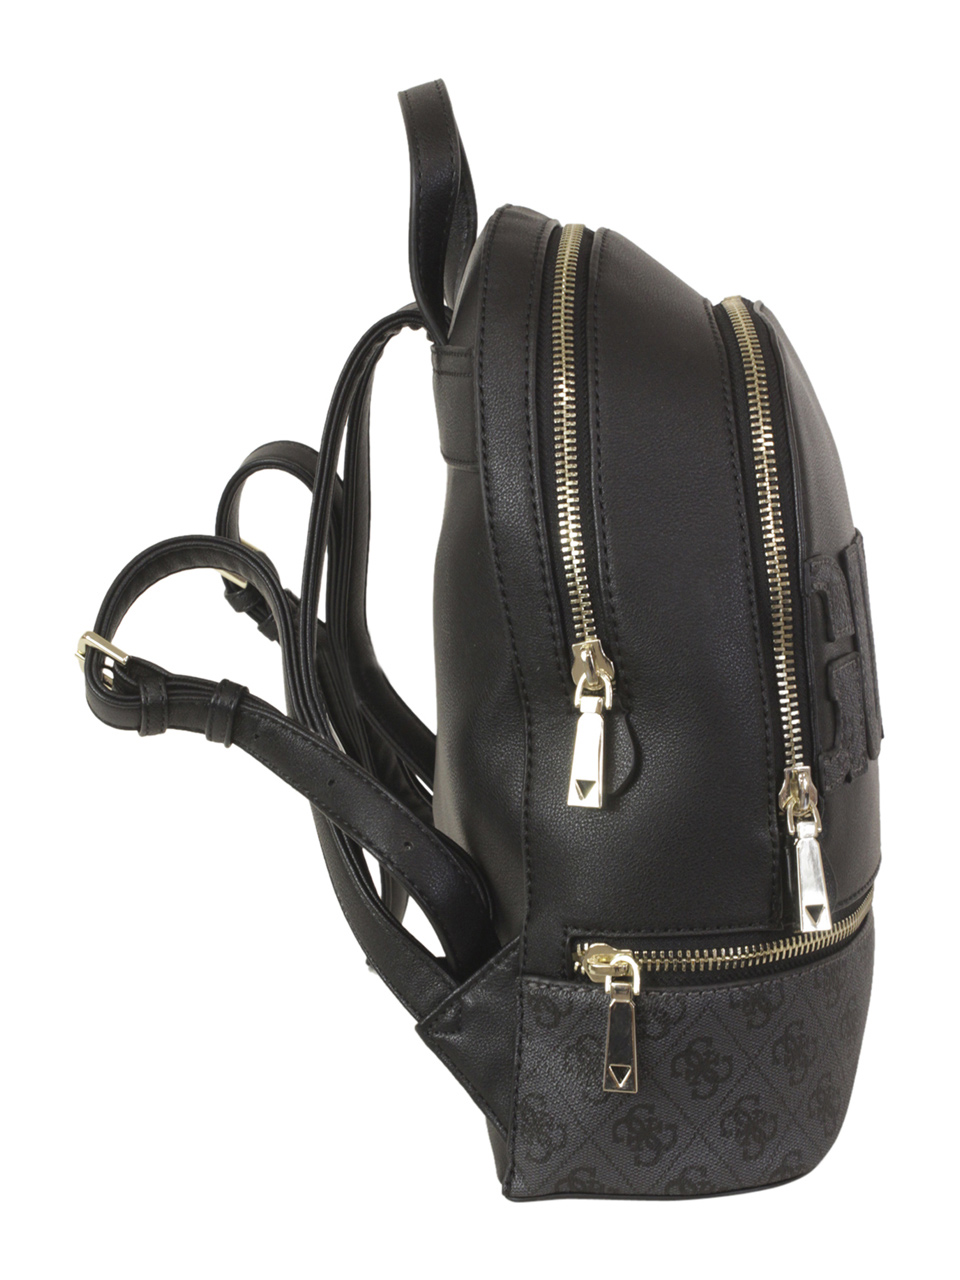 Guess-Women-039-s-Skye-Large-Backpack-Bag thumbnail 12